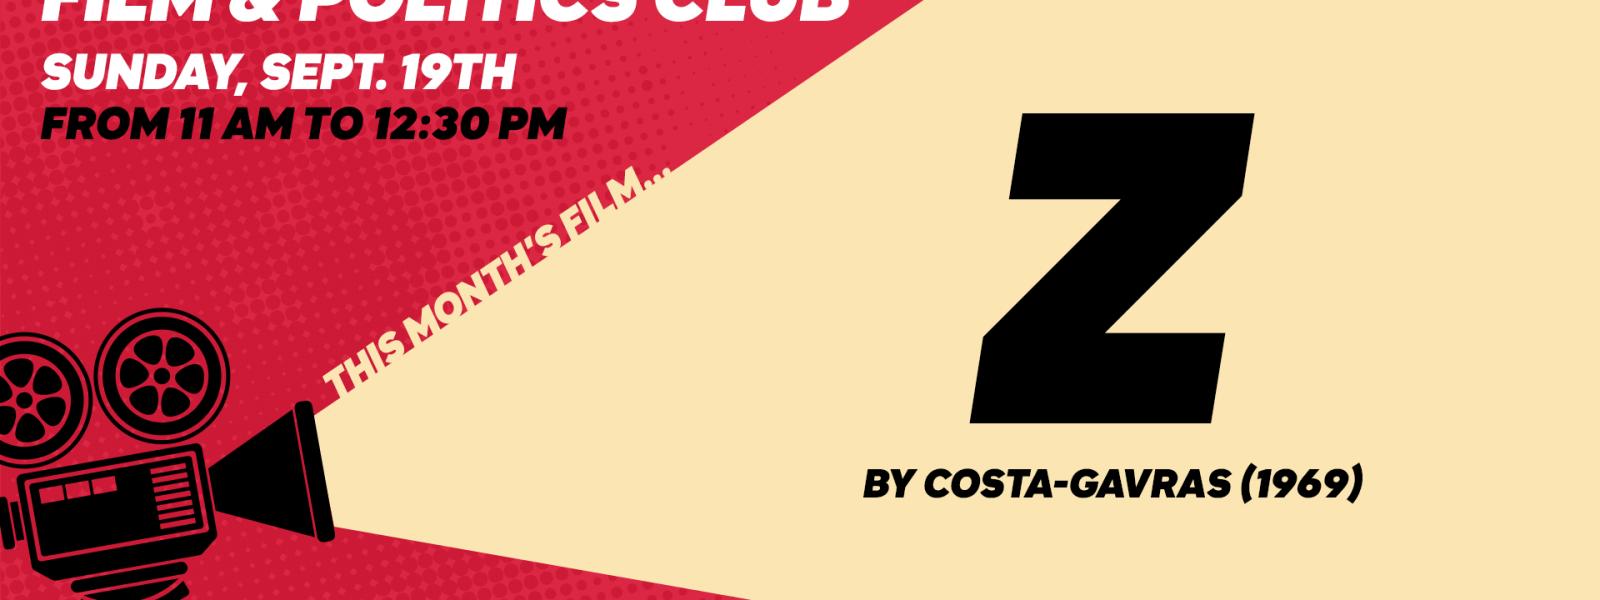 WSILDSA Film & Politics Club Meeting